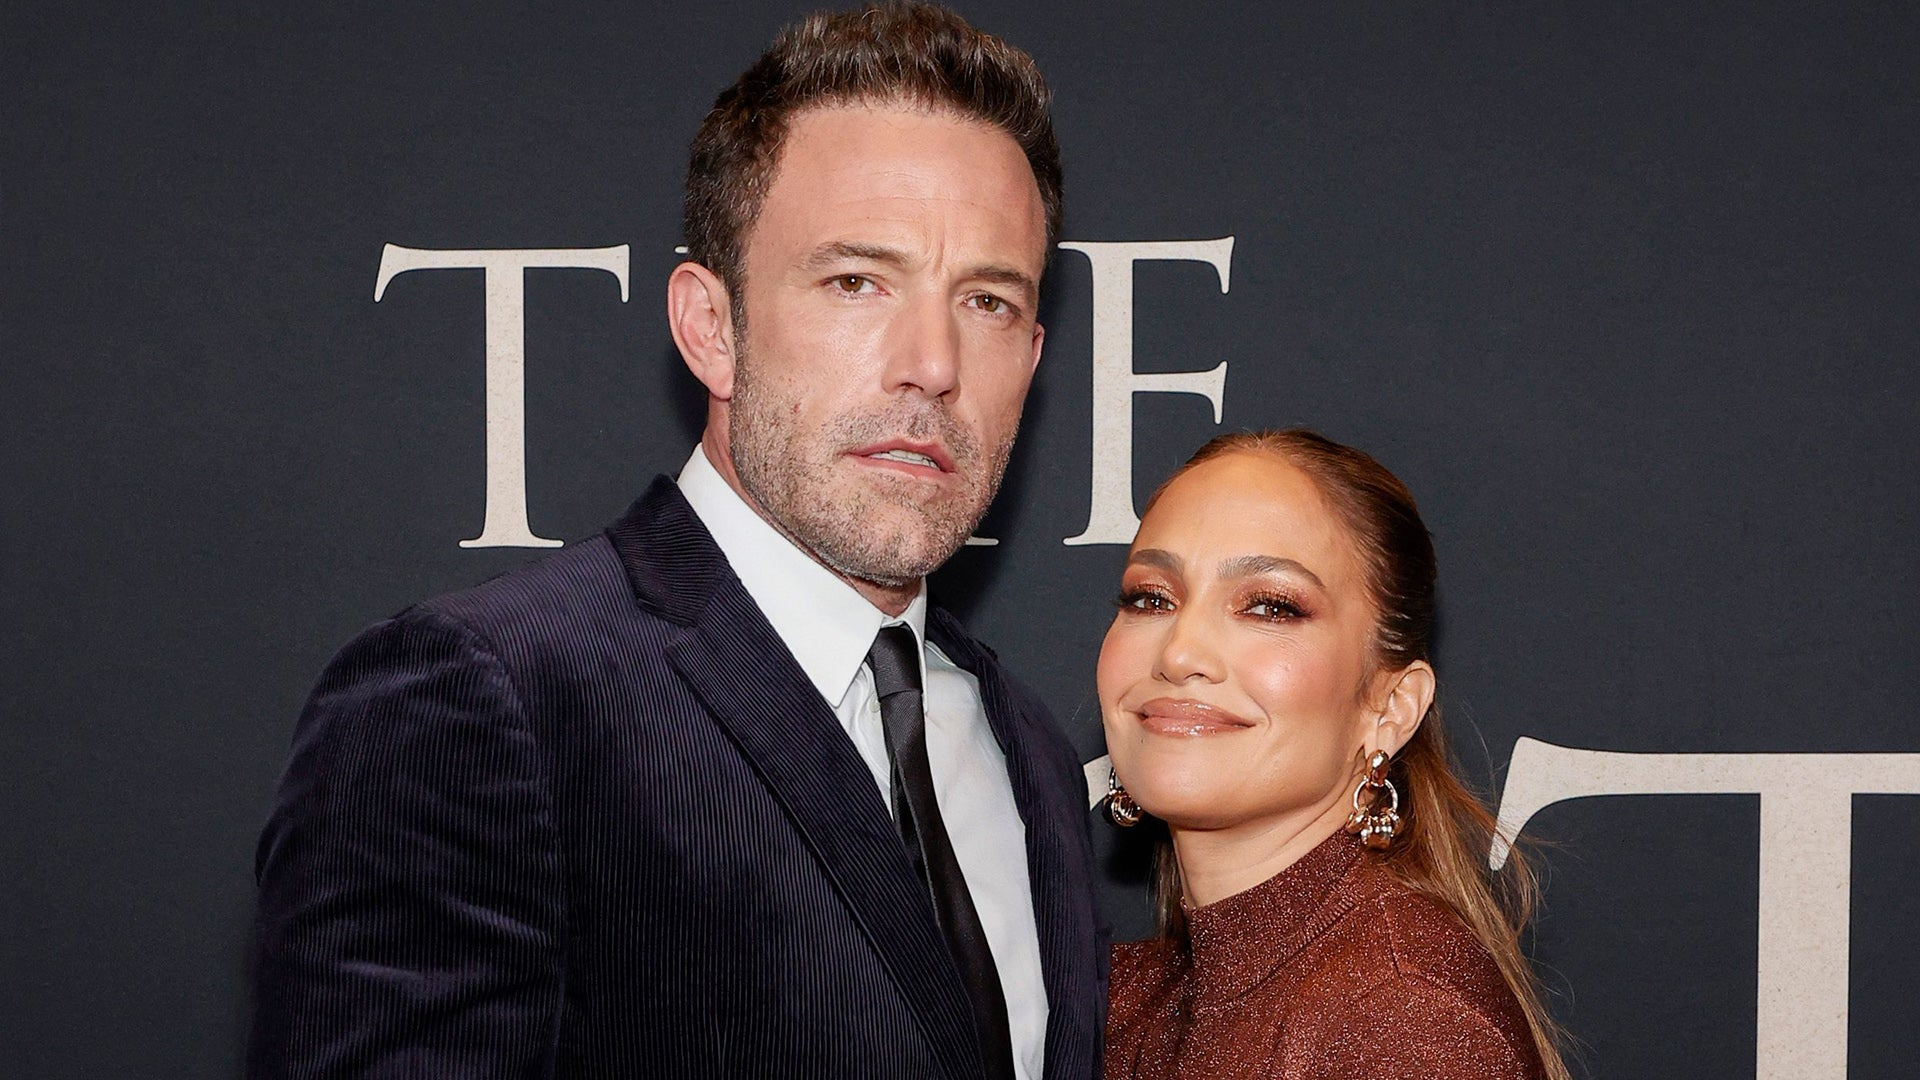 Inside Jennifer Lopez and Ben Affleck's 'Fairy-tale' Romance (Source)